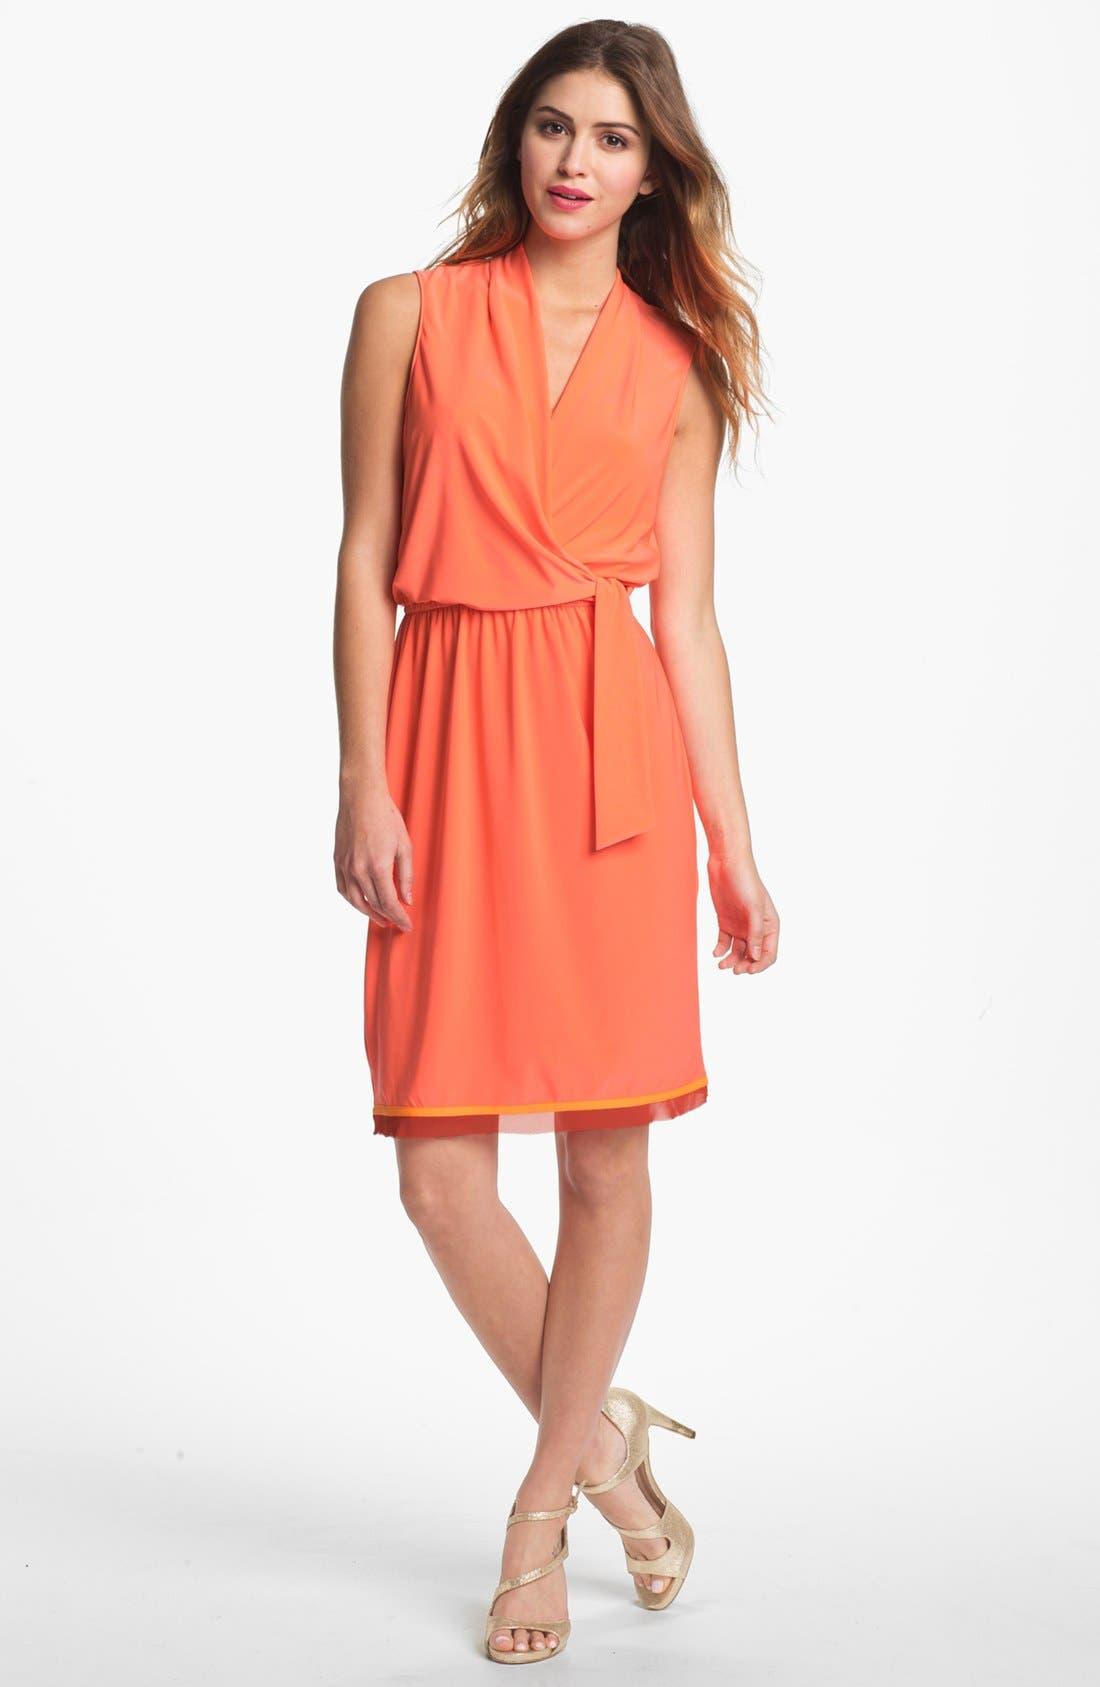 Main Image - T Tahari 'Holley' Dress